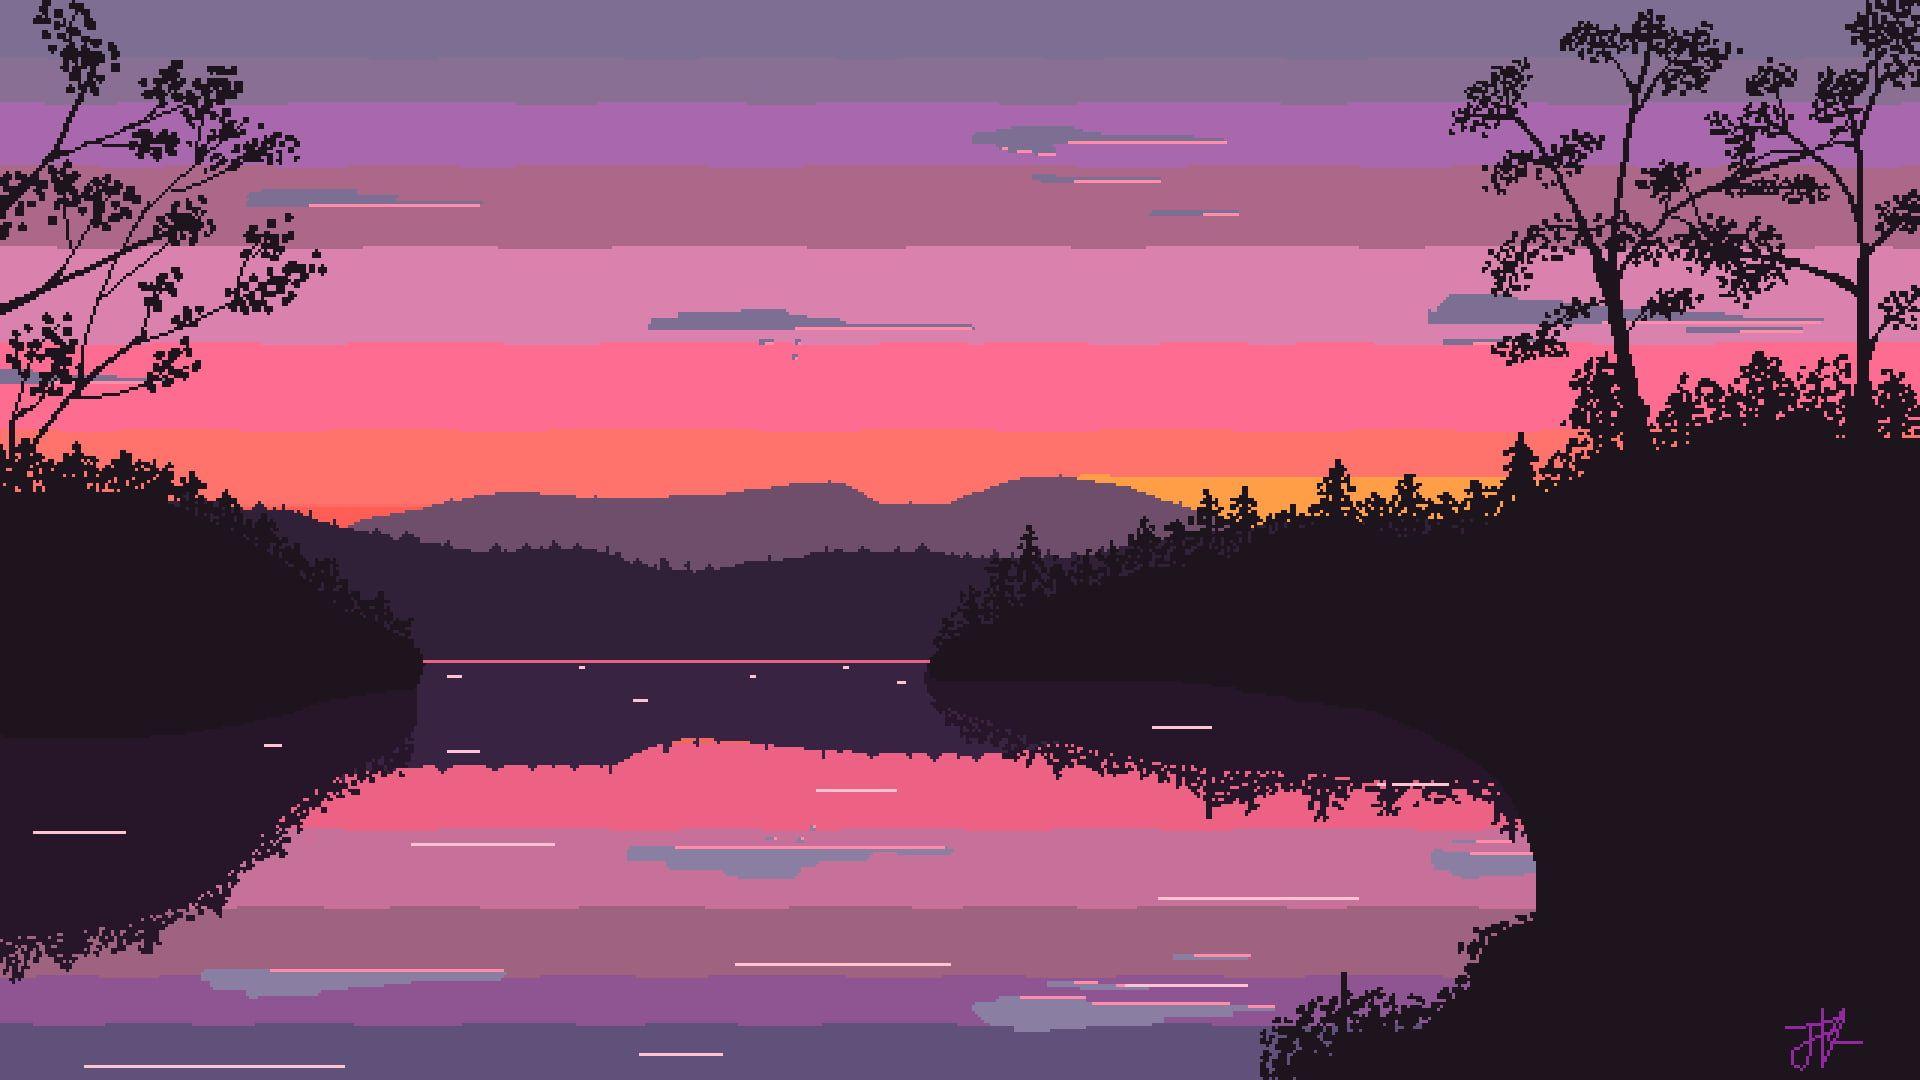 Pixel Art Digital Art Pixelated Pixels Nature Landscape Trees Lake Sunset Clouds Reflec Pixel Art Landscape Pixel Art Background Desktop Wallpaper Art